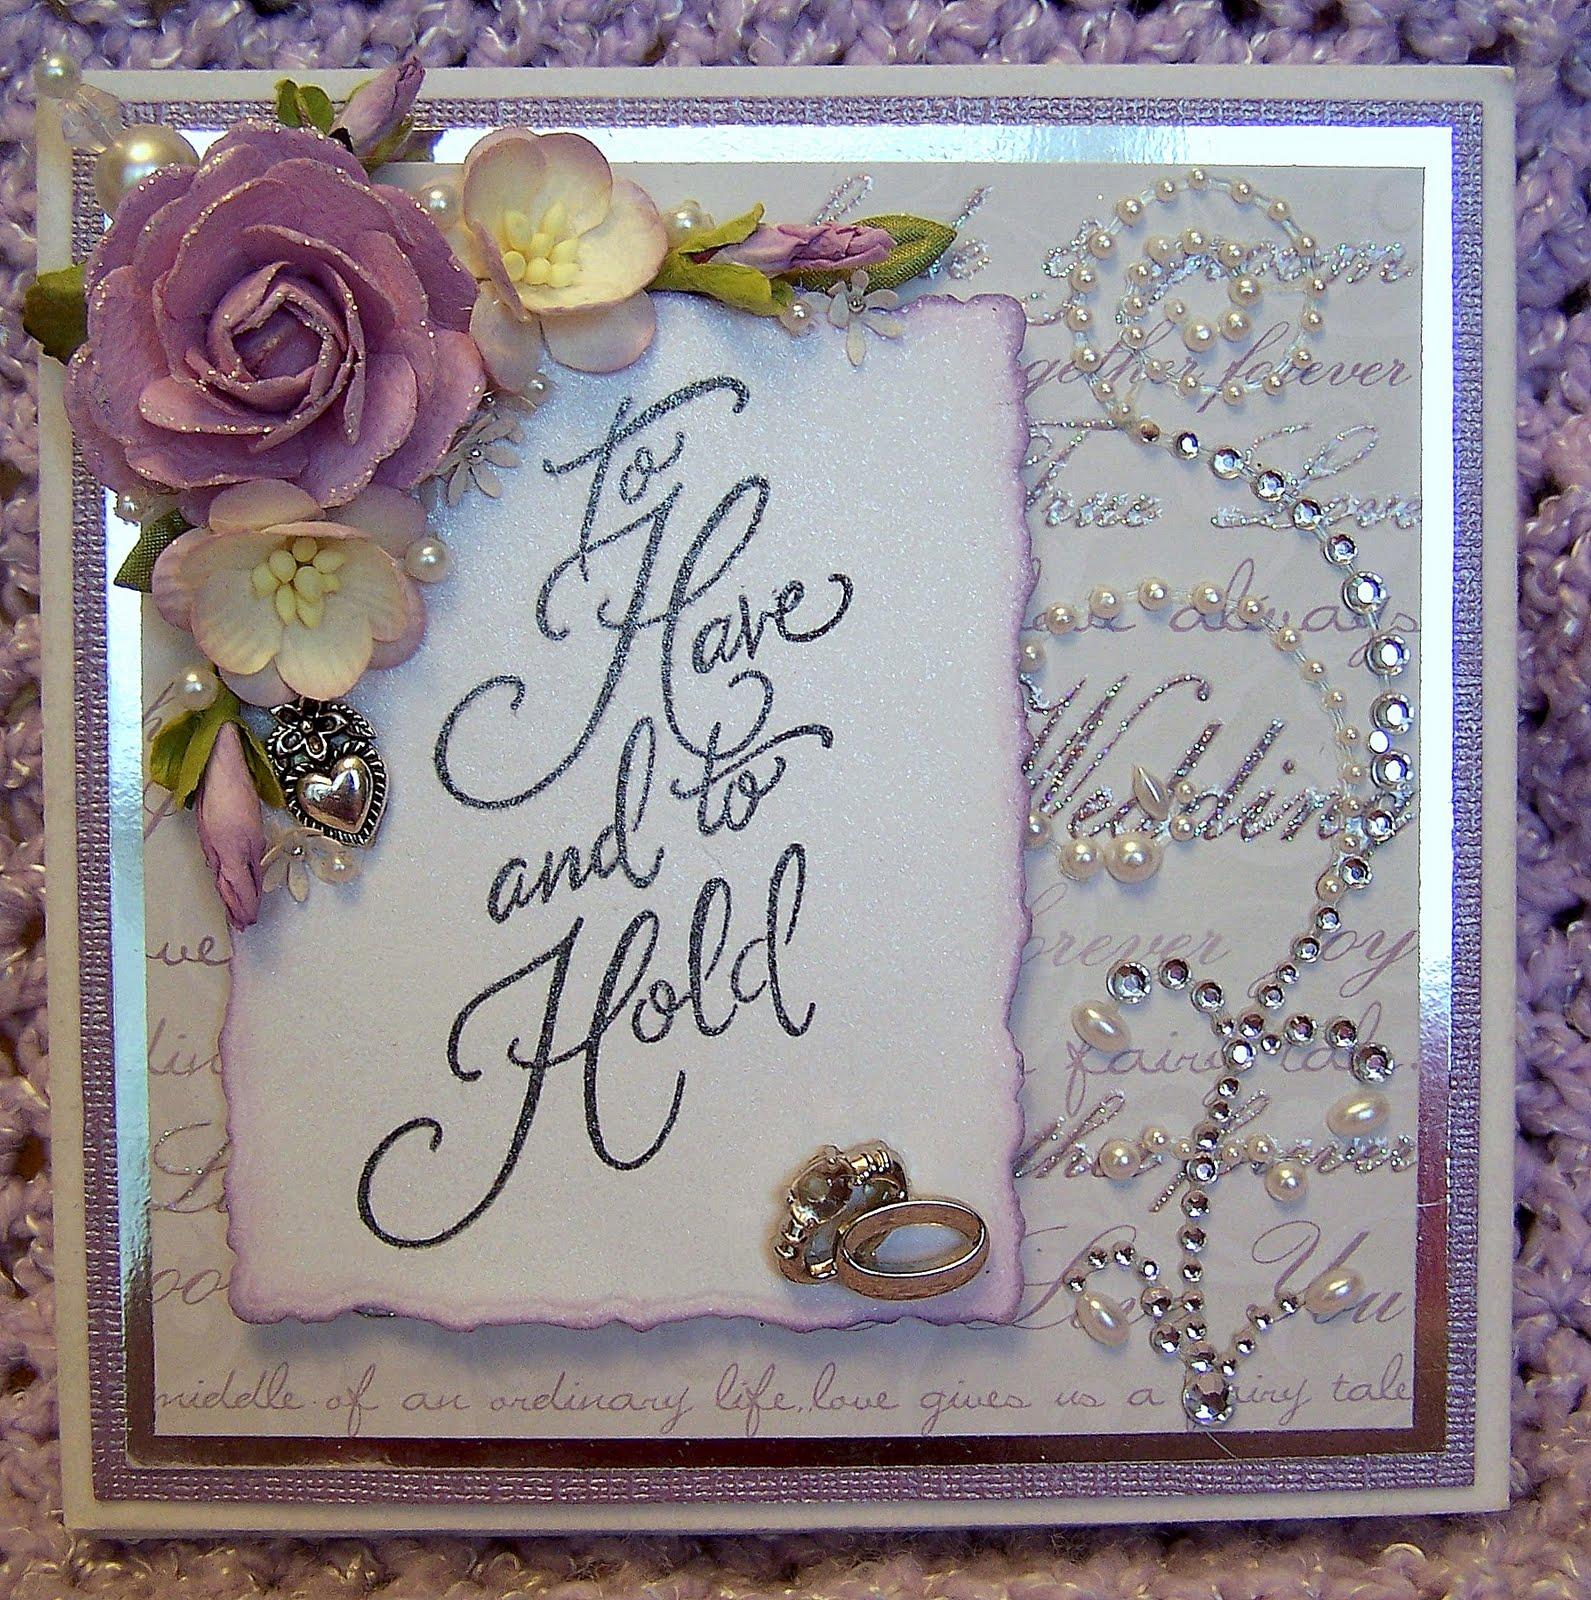 13 Homemade Wedding Cards Design Images - Handmade Wedding ...